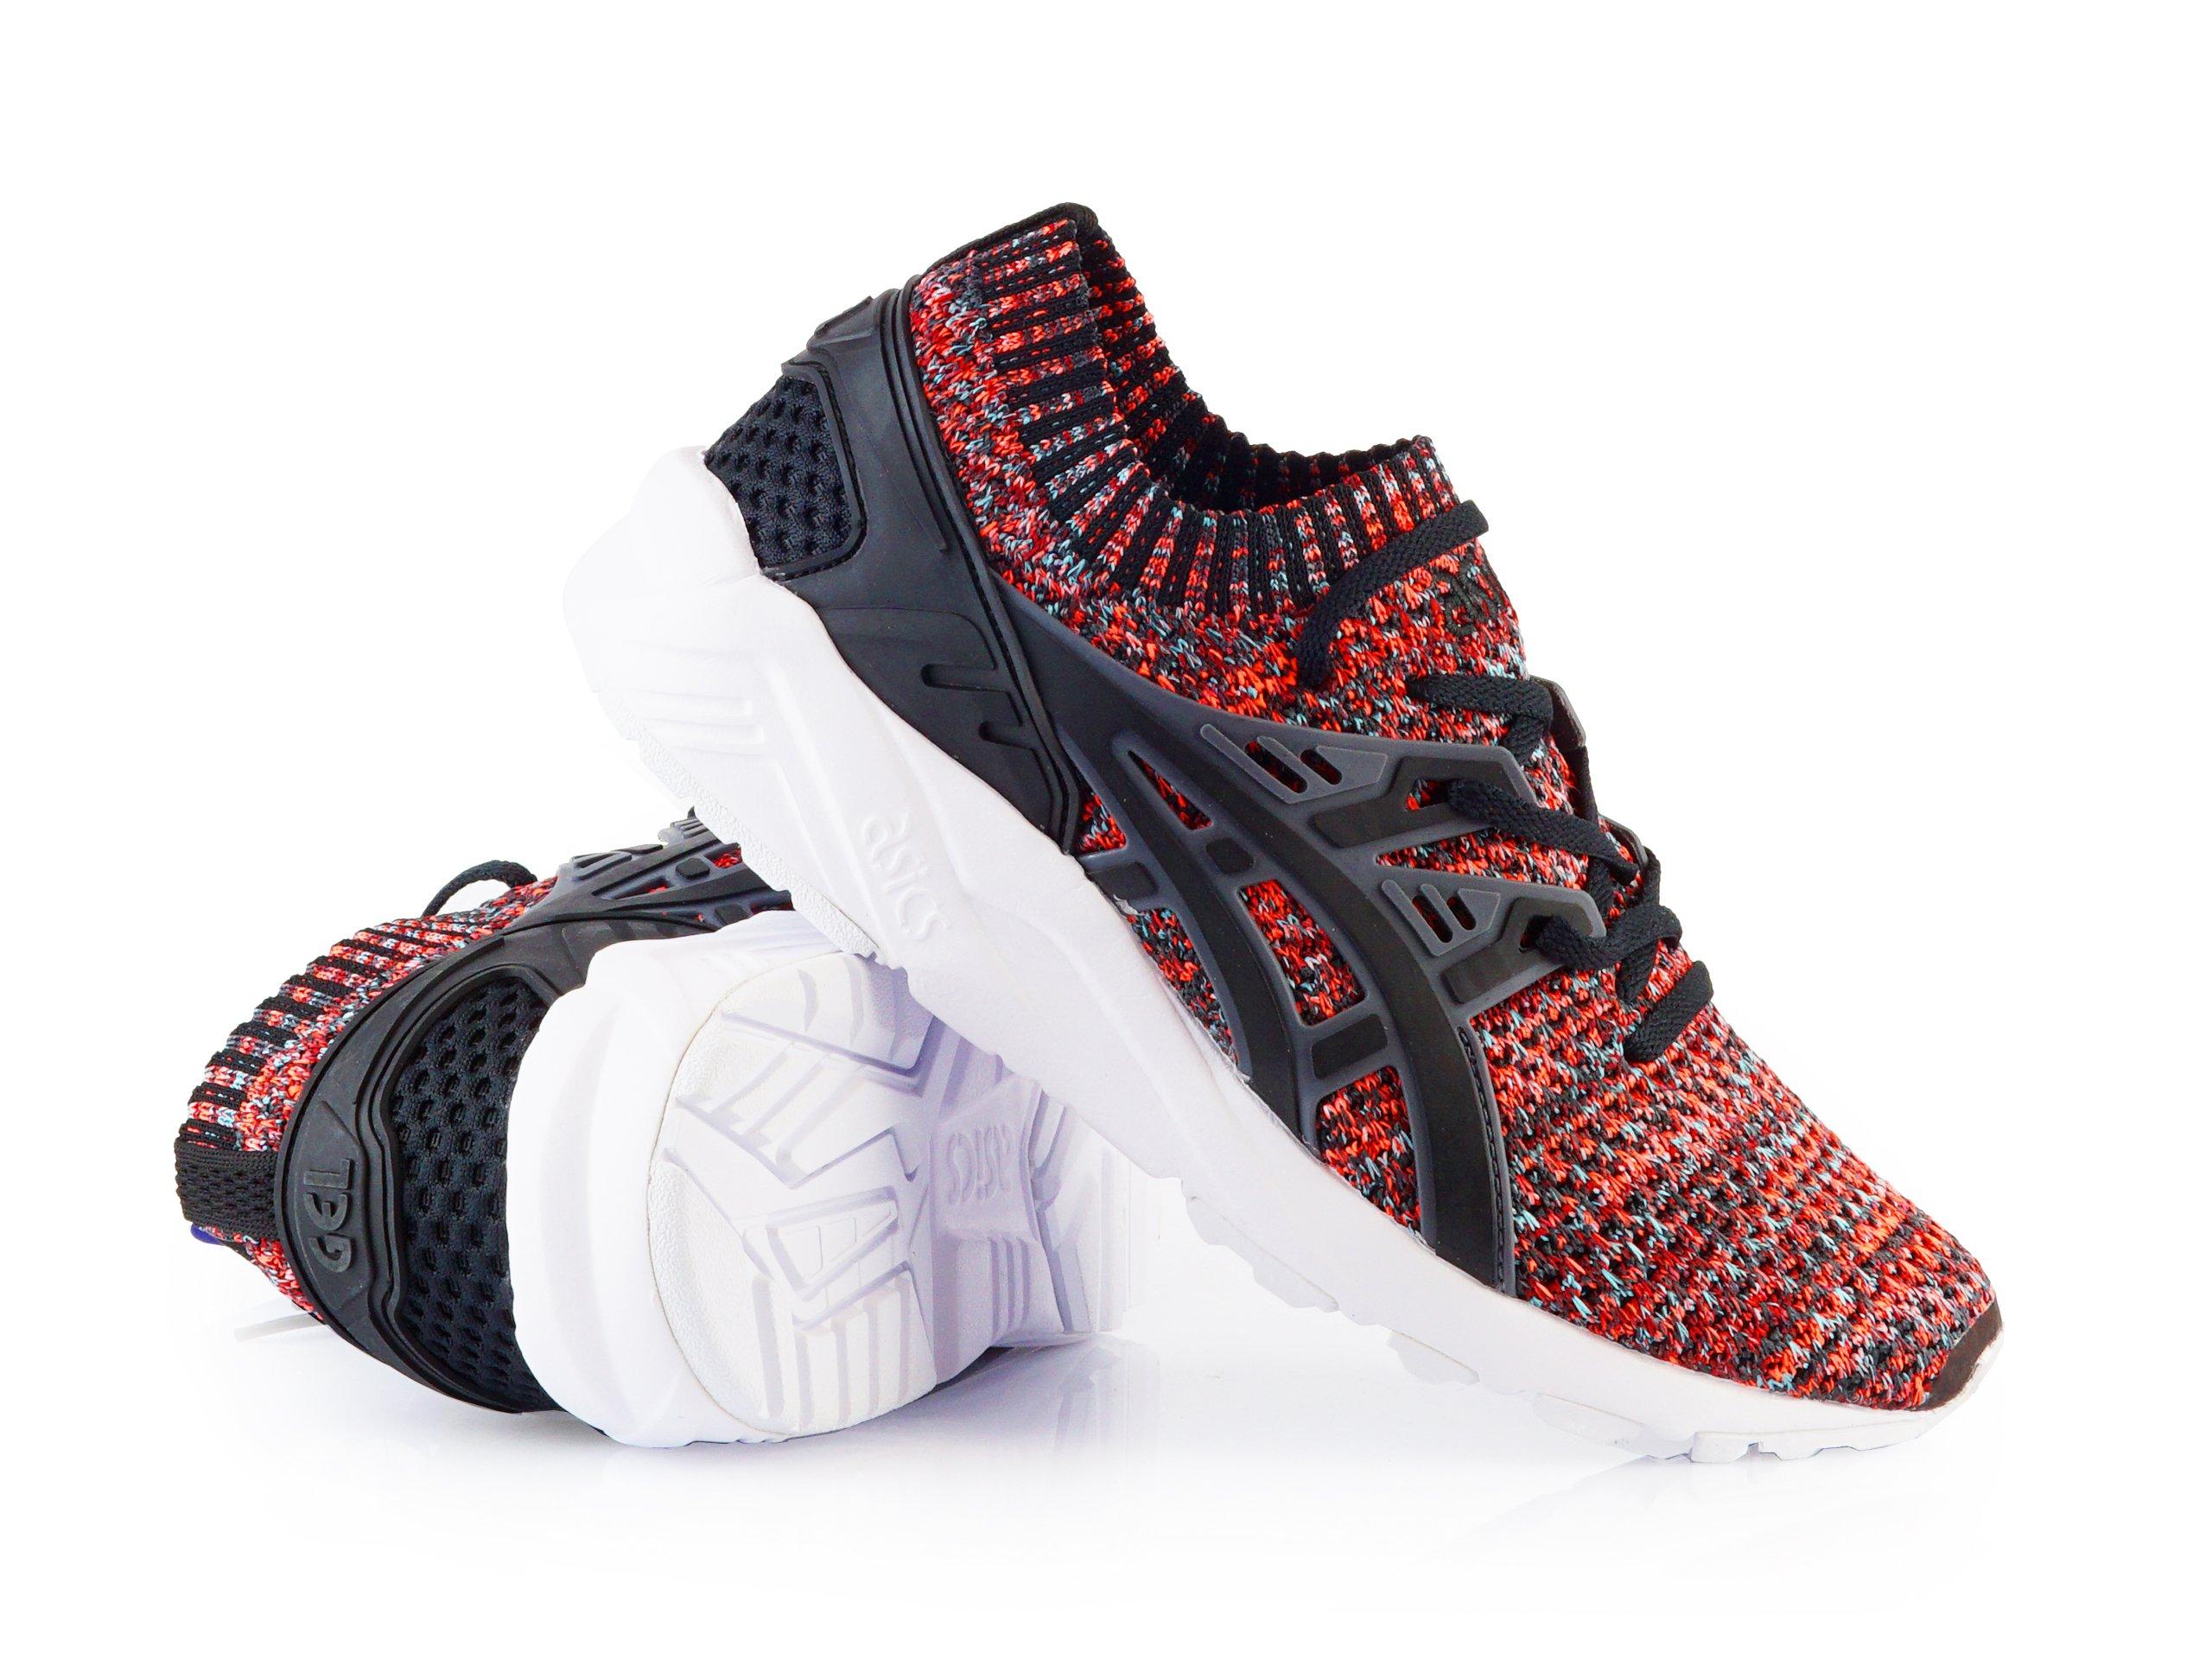 Asics - Gel-Kayano trainer knit HN7M4-9790 - Sneakers - Black ...